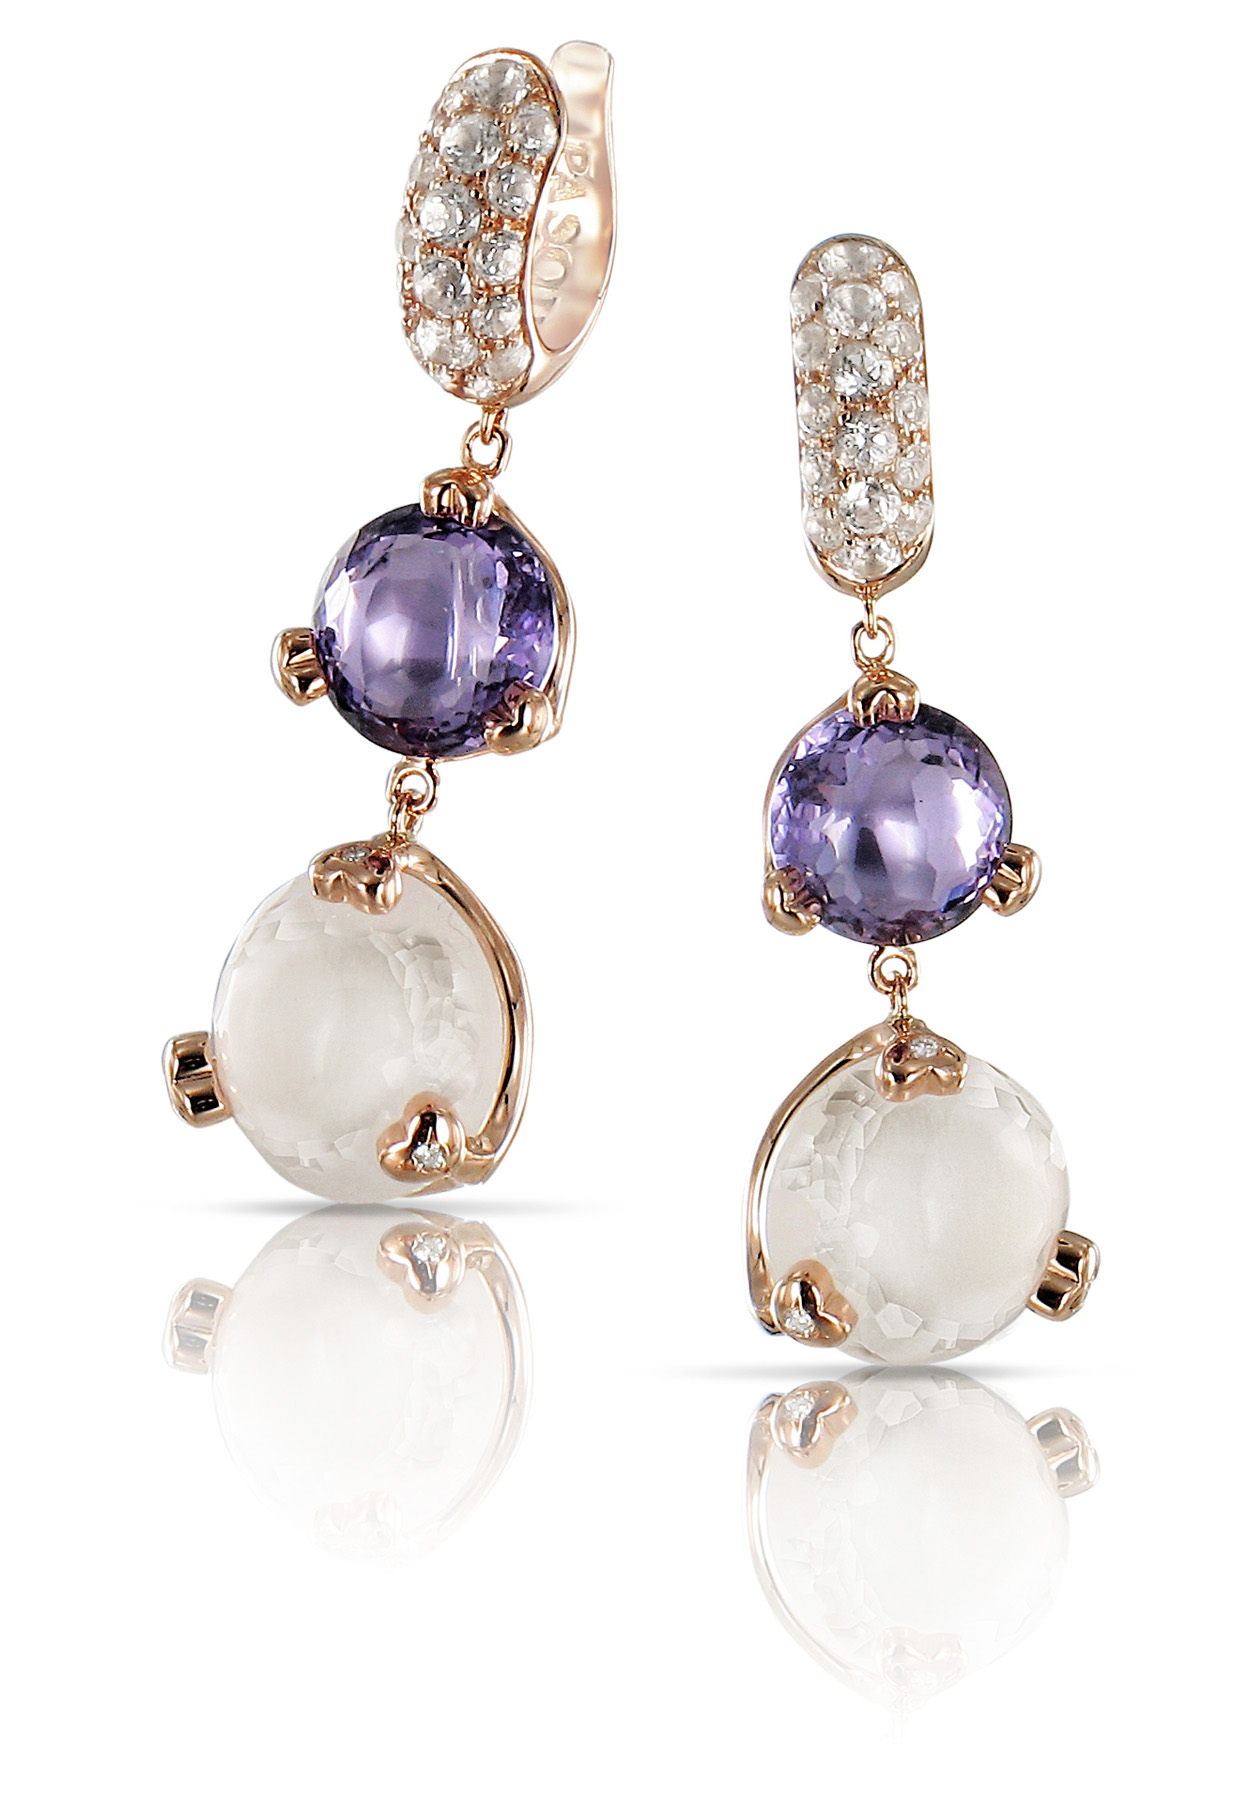 Sissi Io Amo_earrings_14562R.jpg